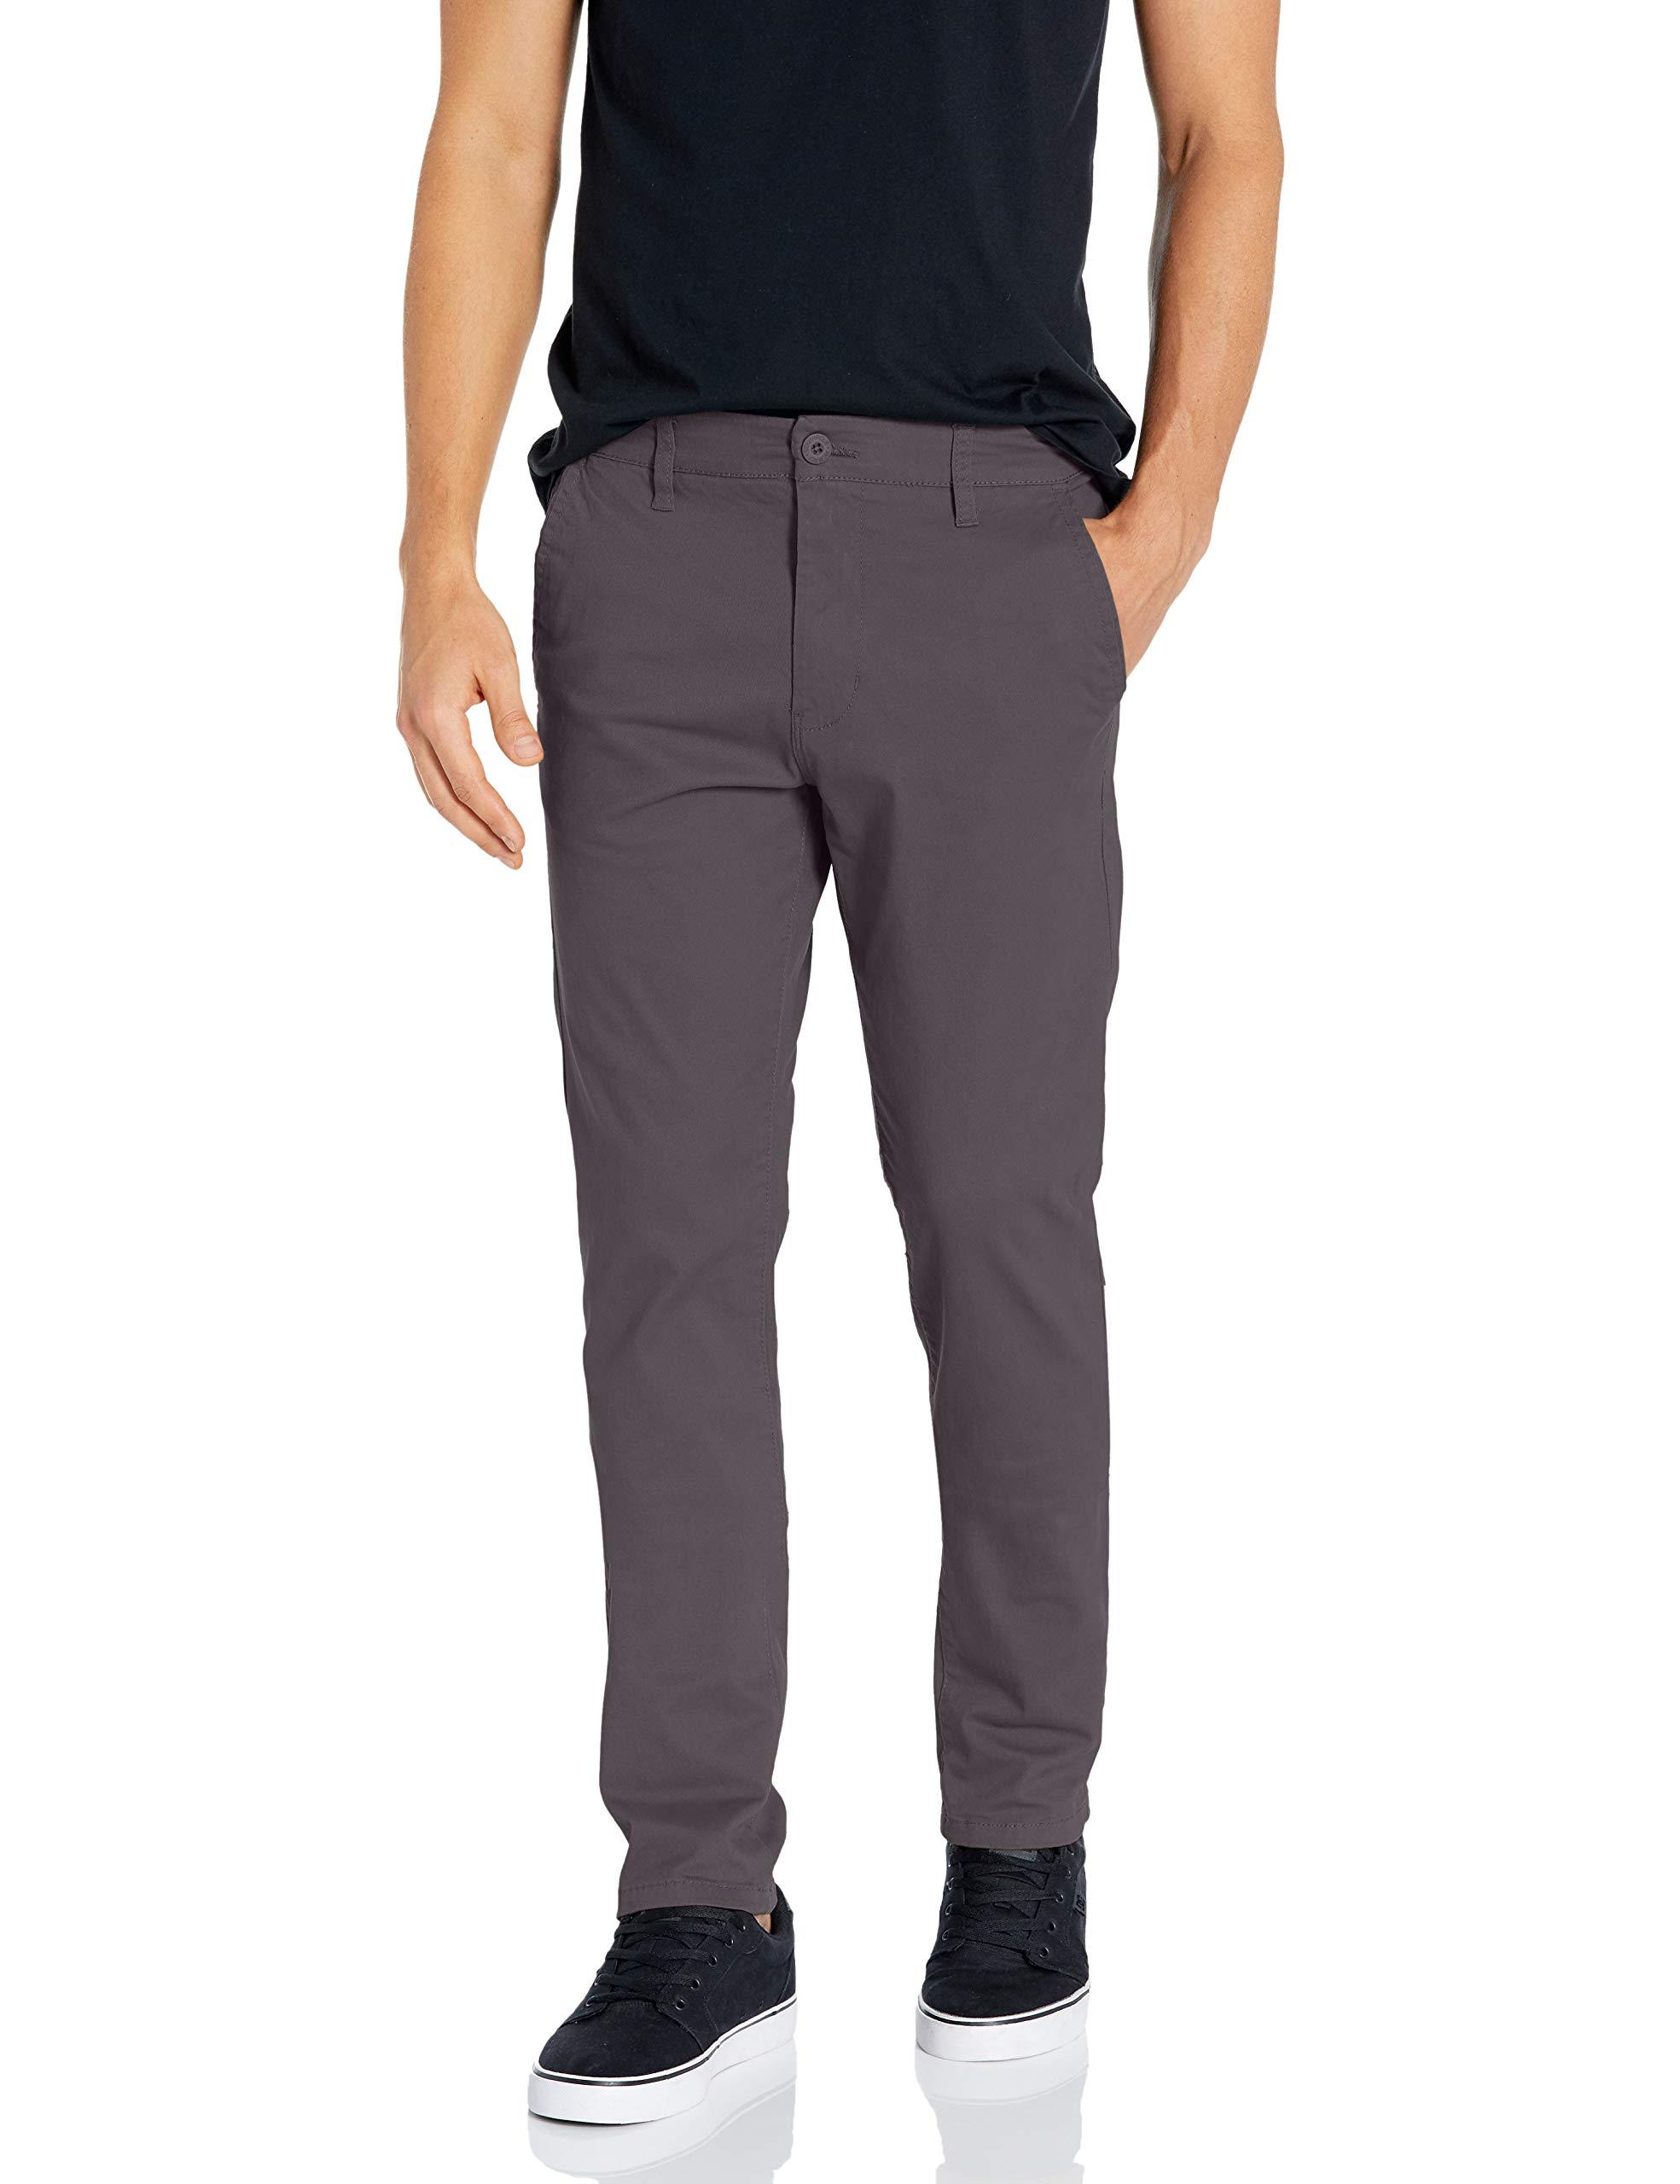 Southpole Men's Flex Stretch Basic Long Chino Pants